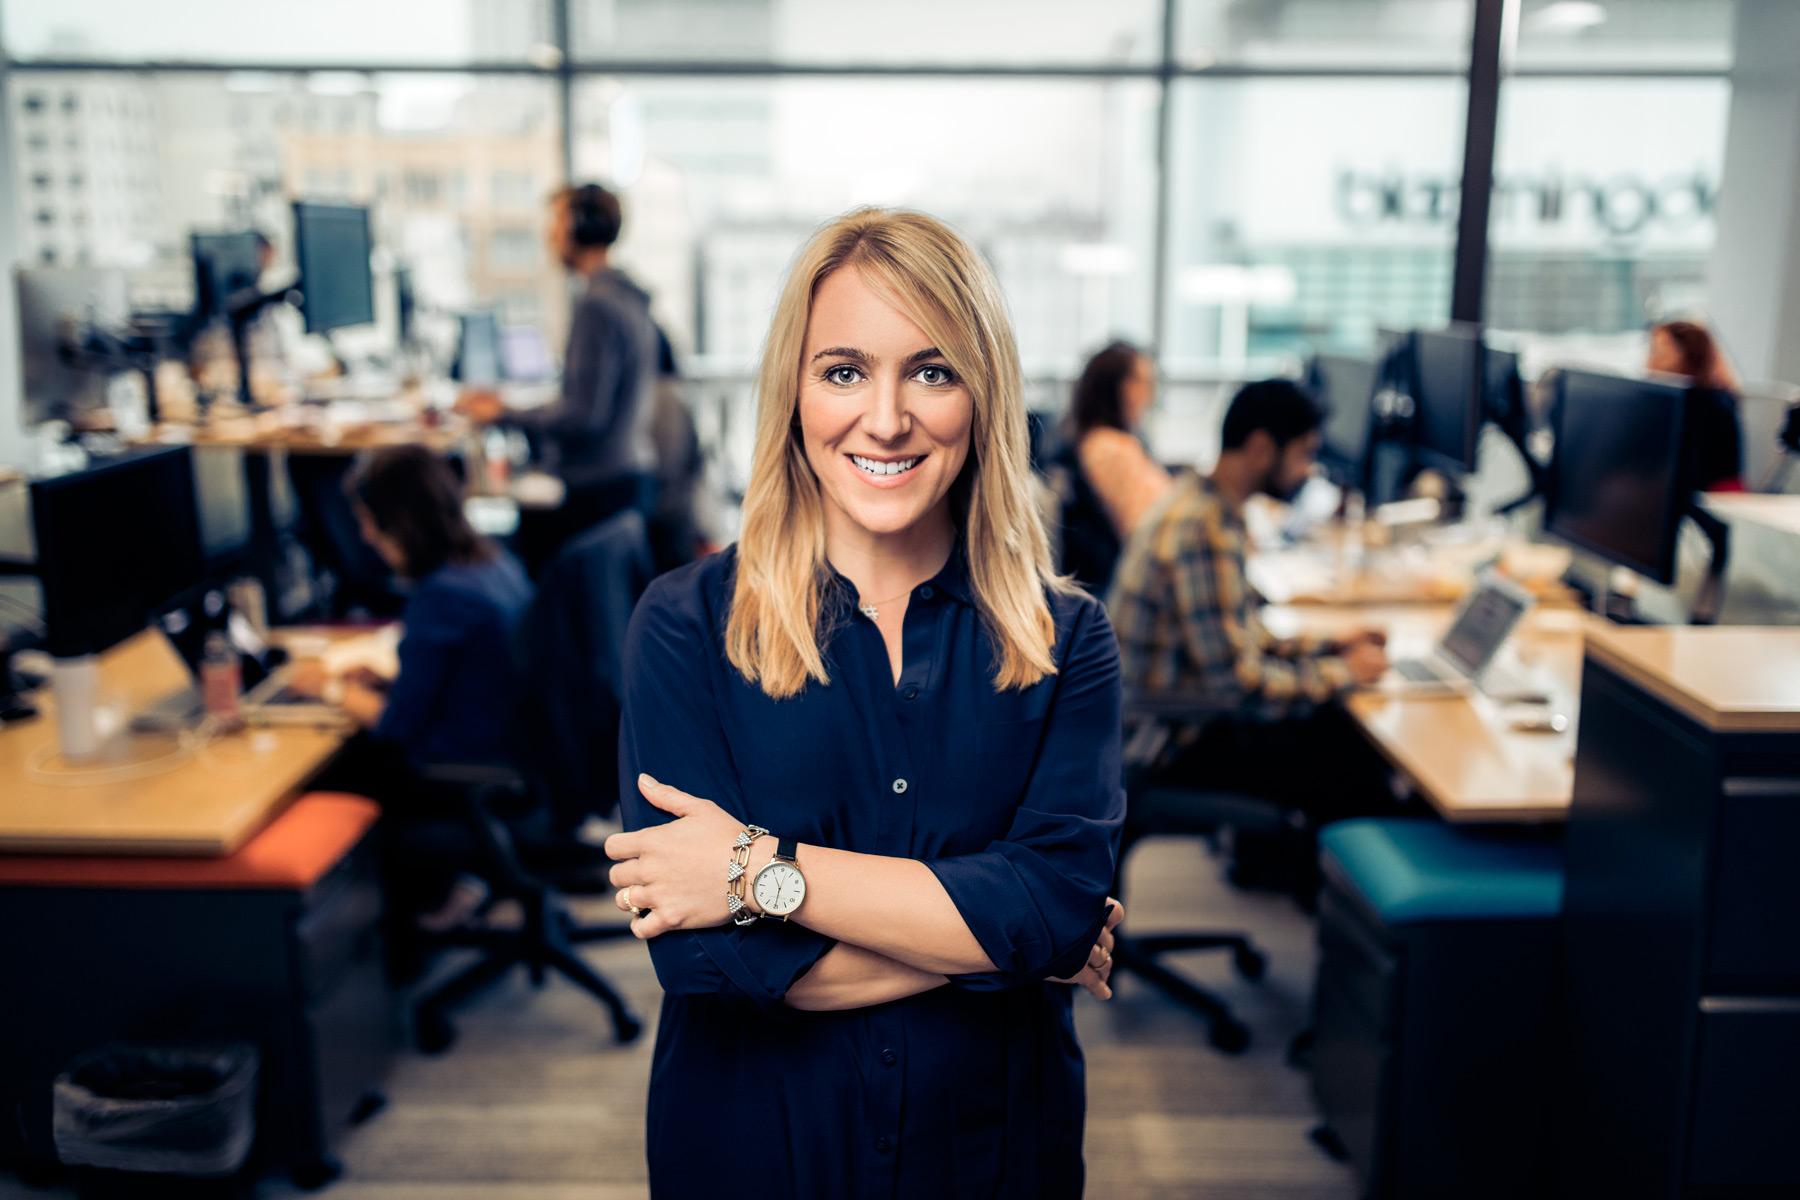 Slack Chief Product Officer April Underwood